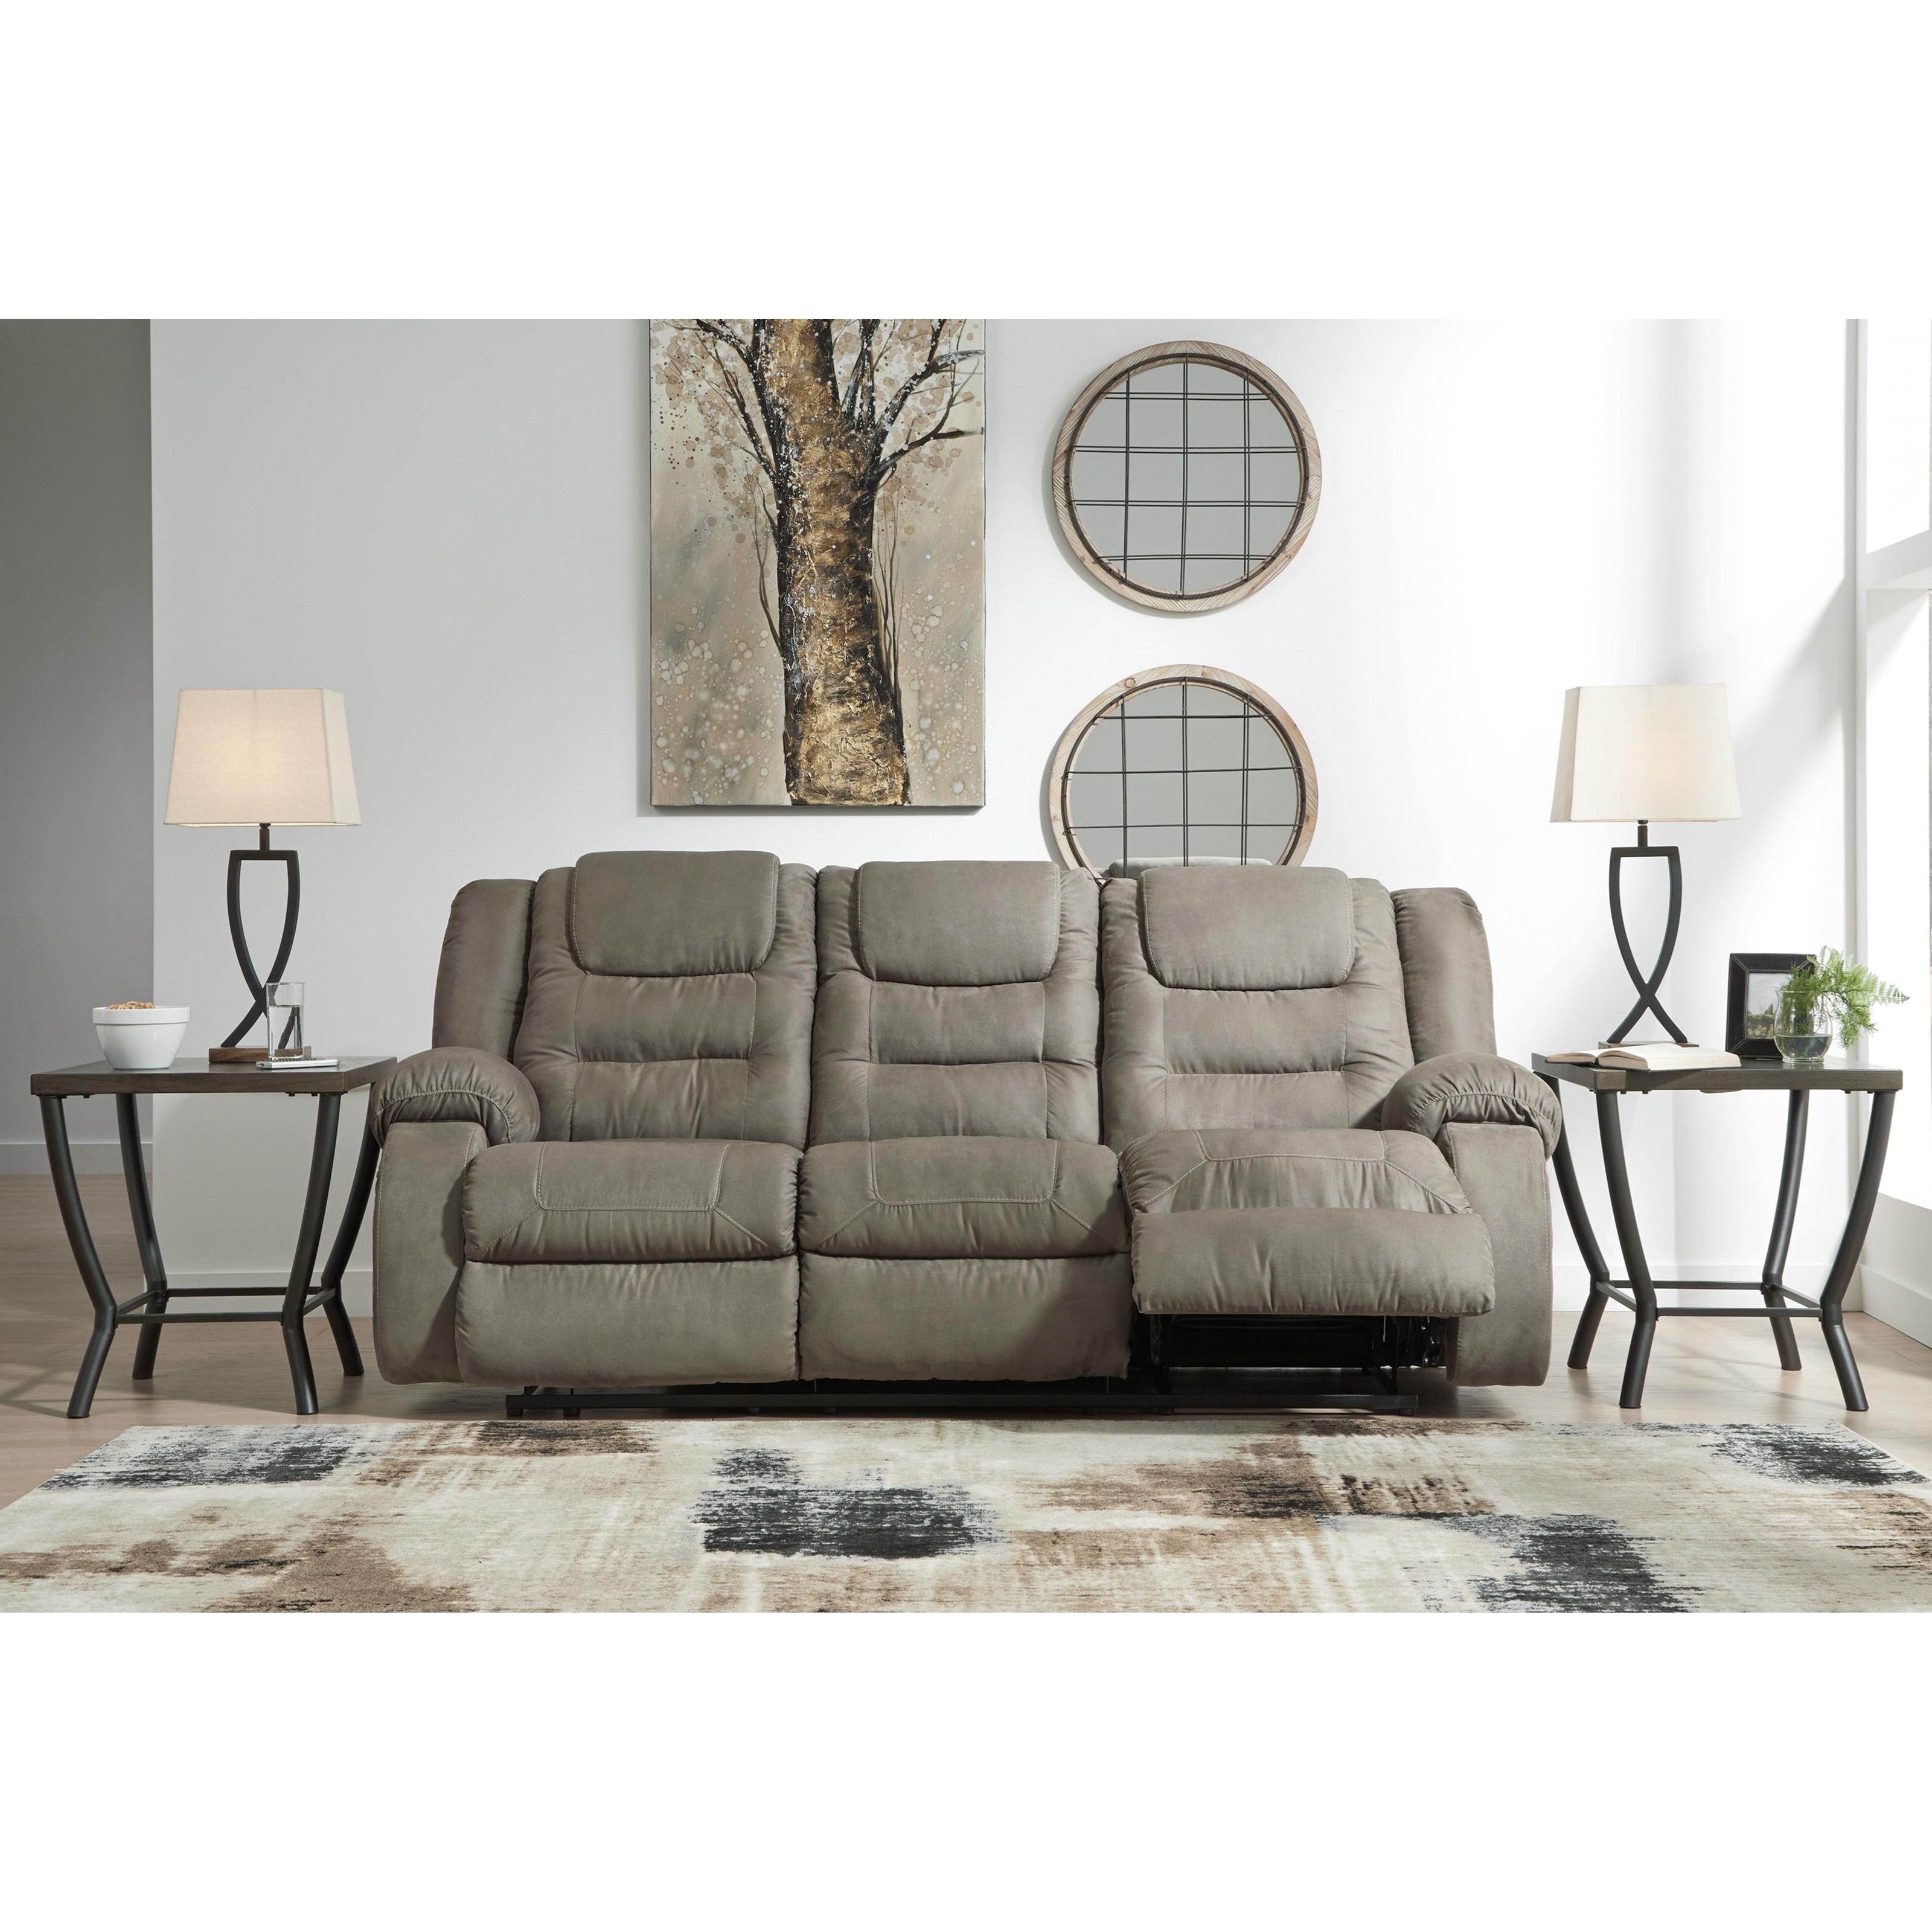 Signature Design By Ashley Segburg Casual Reclining Sofa